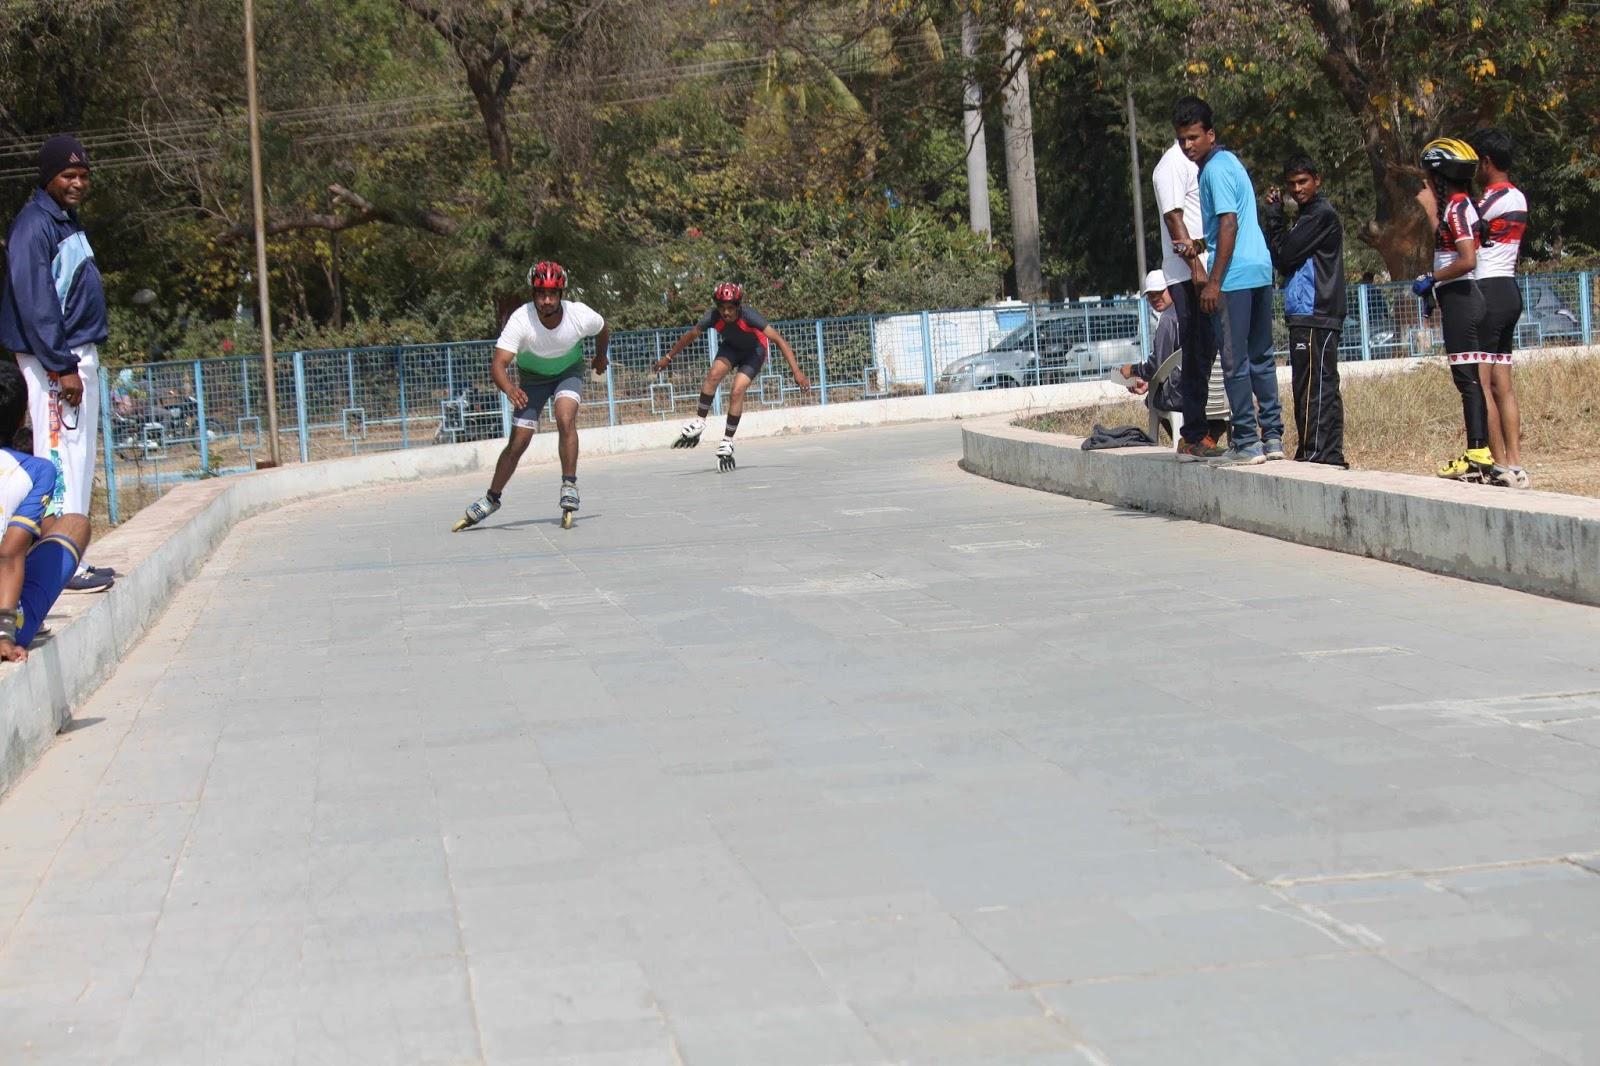 skating classes at kondapur in hyderabad buy roller skates online skate roller skates for kids price best roller skate barbie roller skates